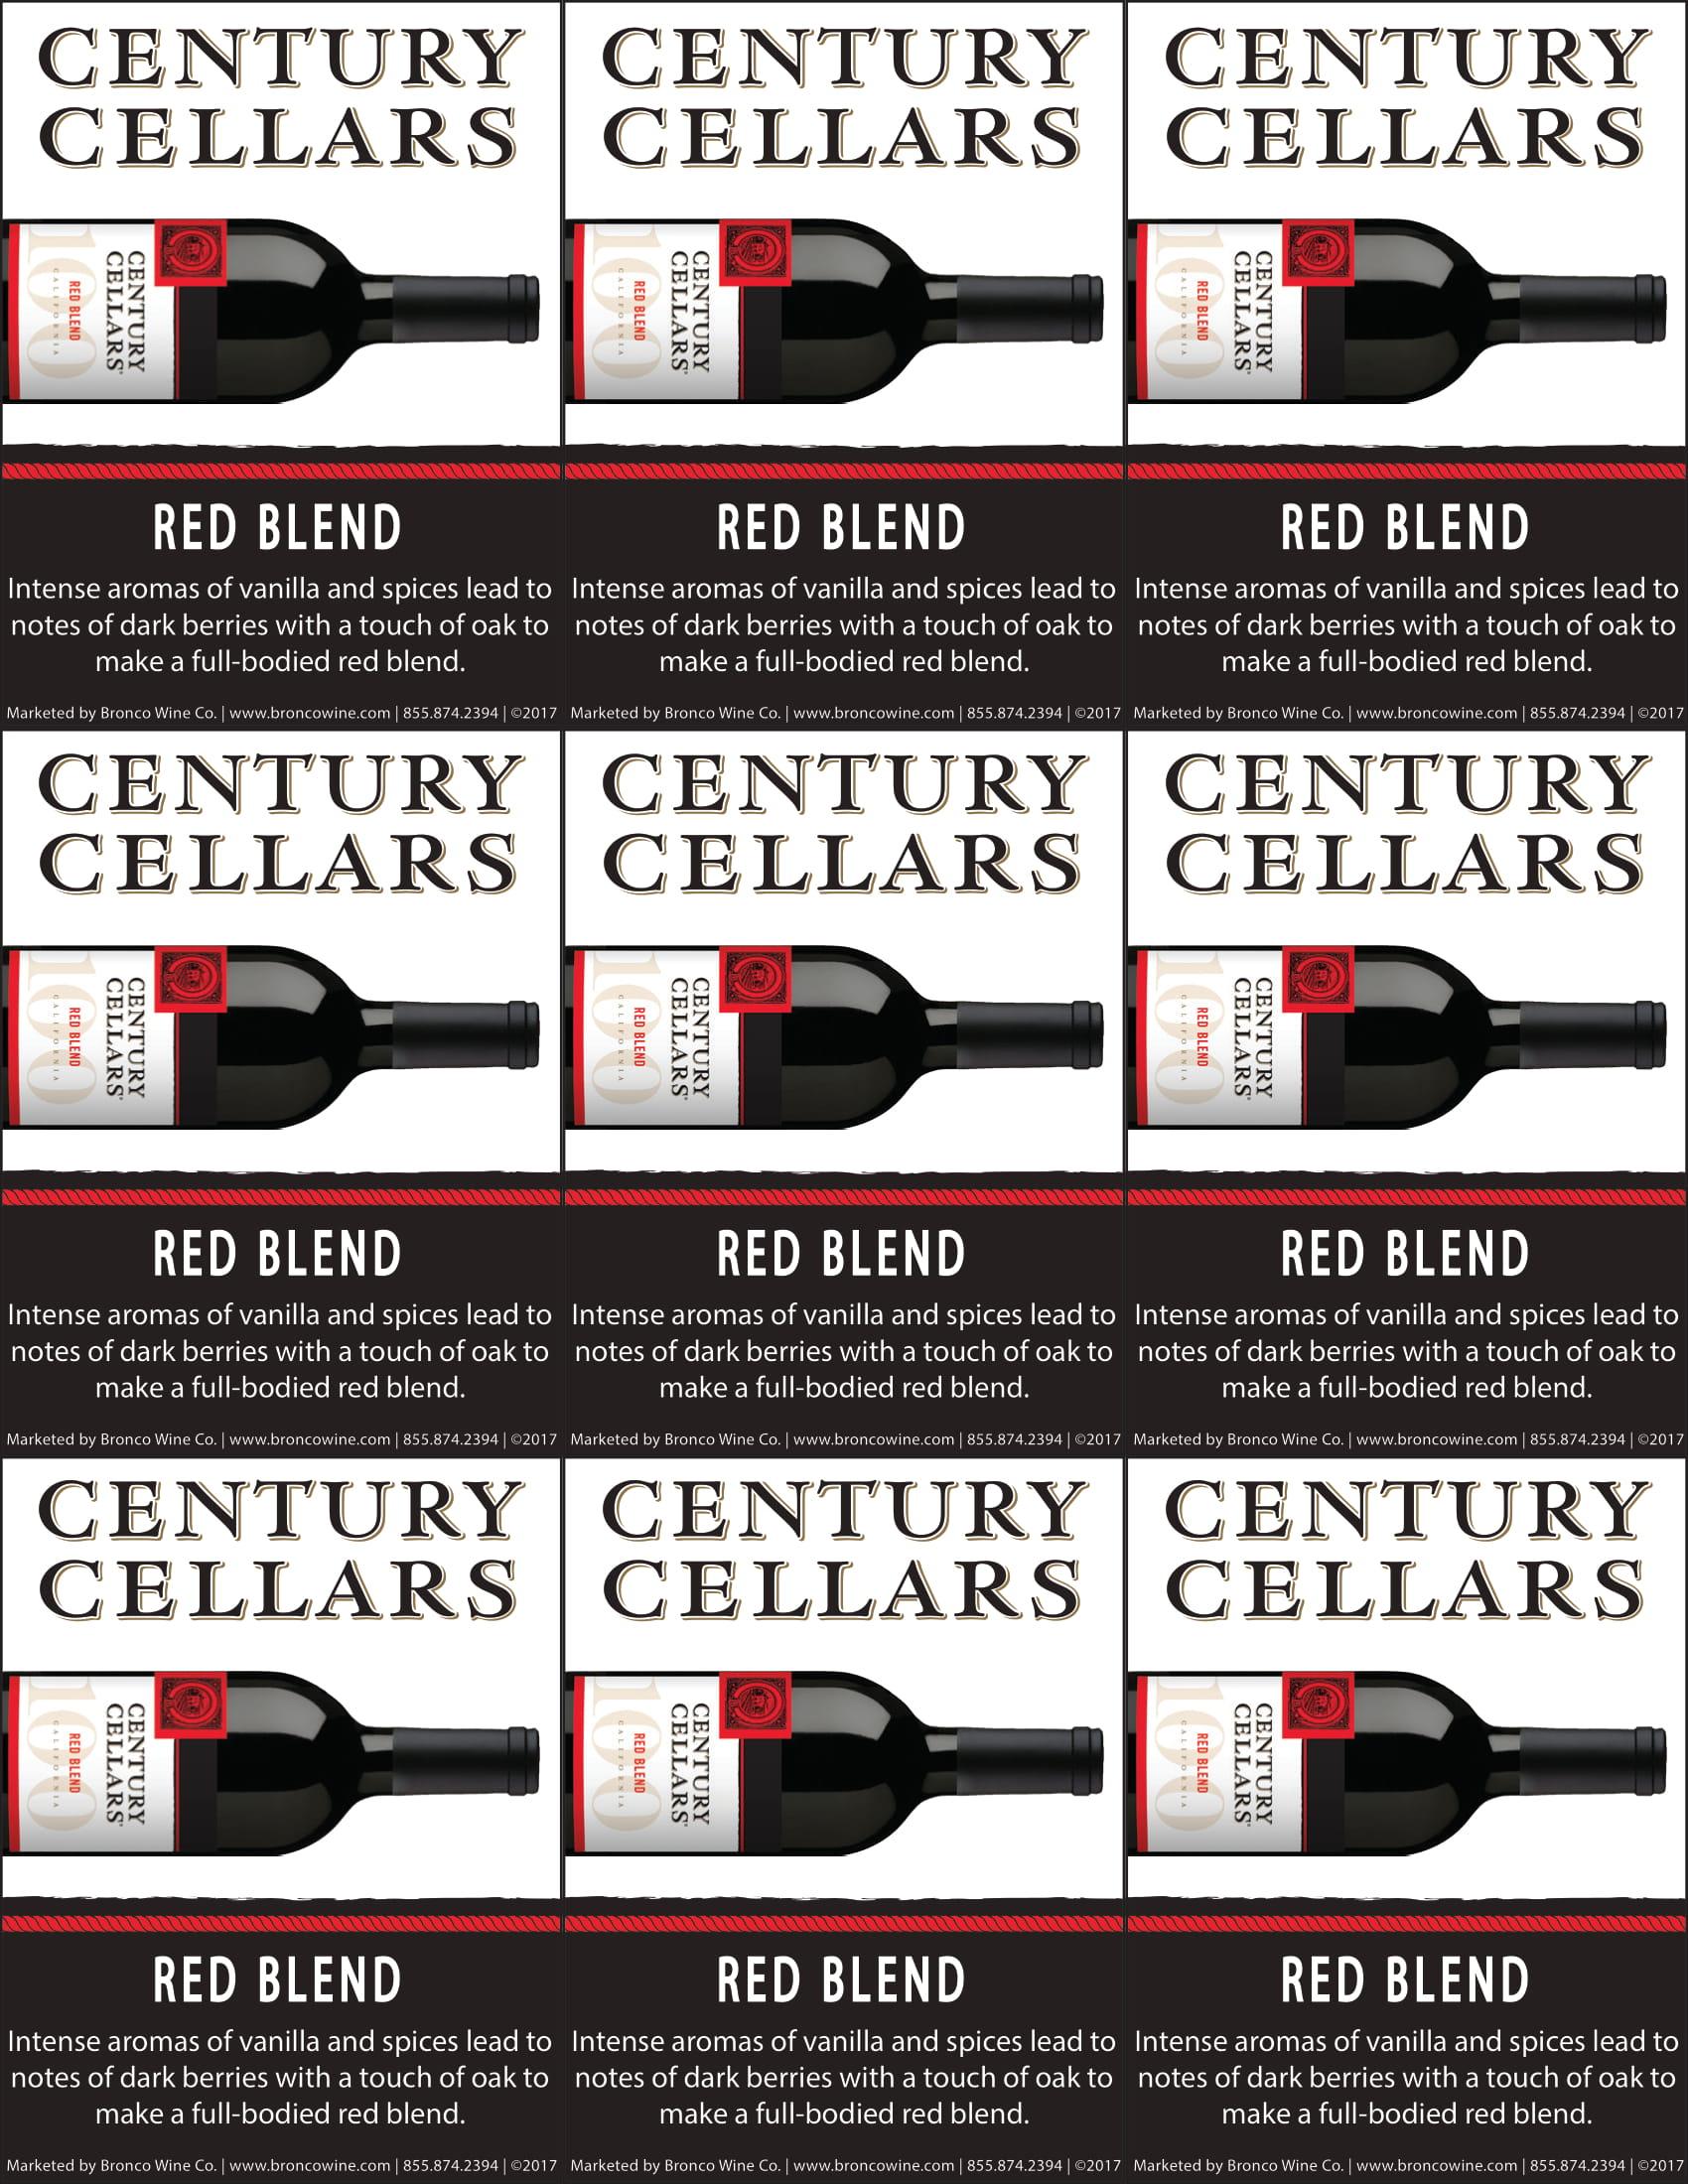 Century Cellars Red Blend Shelf Talkers